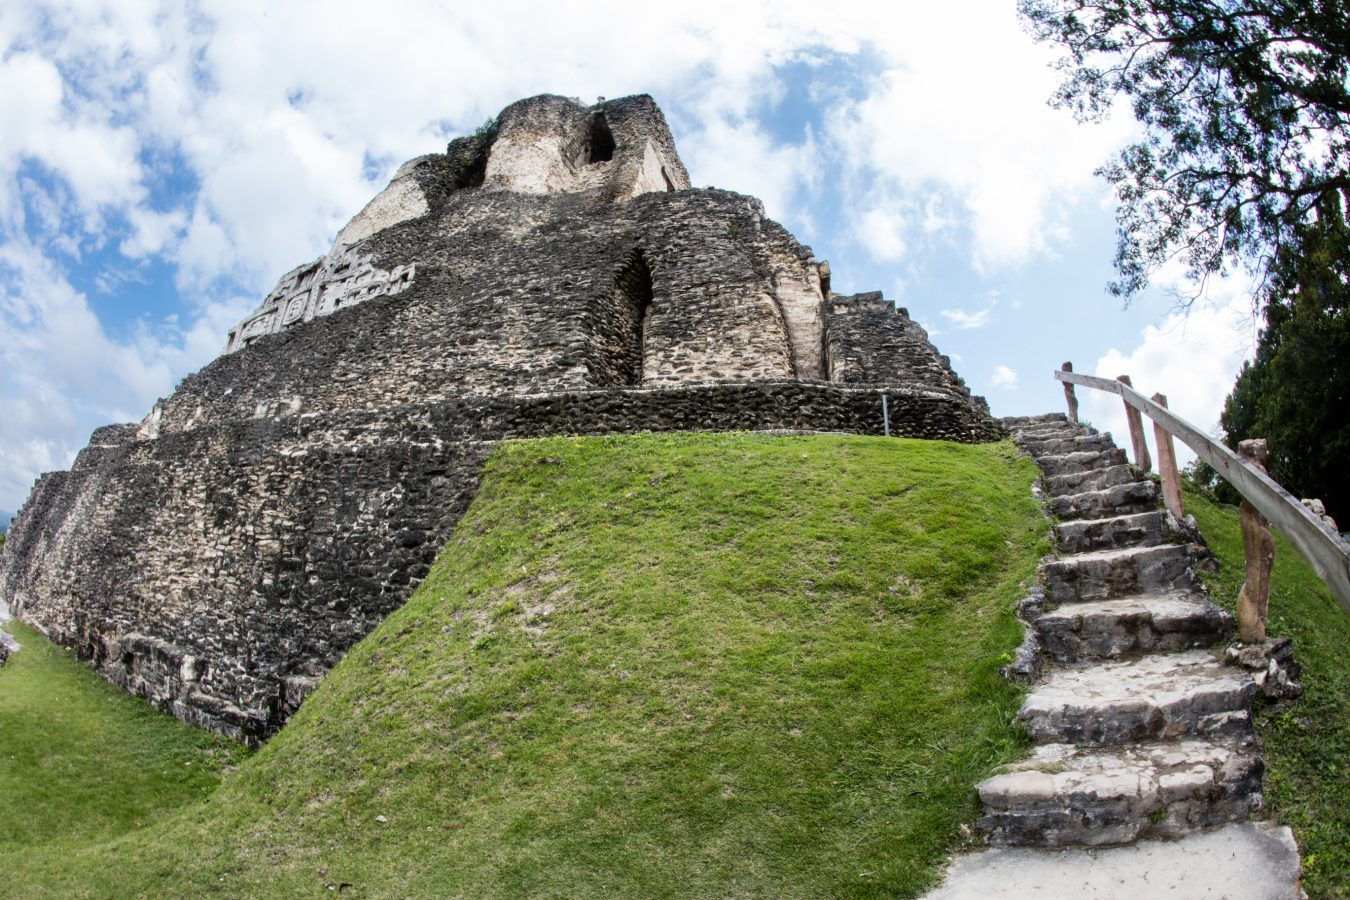 Travel to San Ignacio Belize This Year